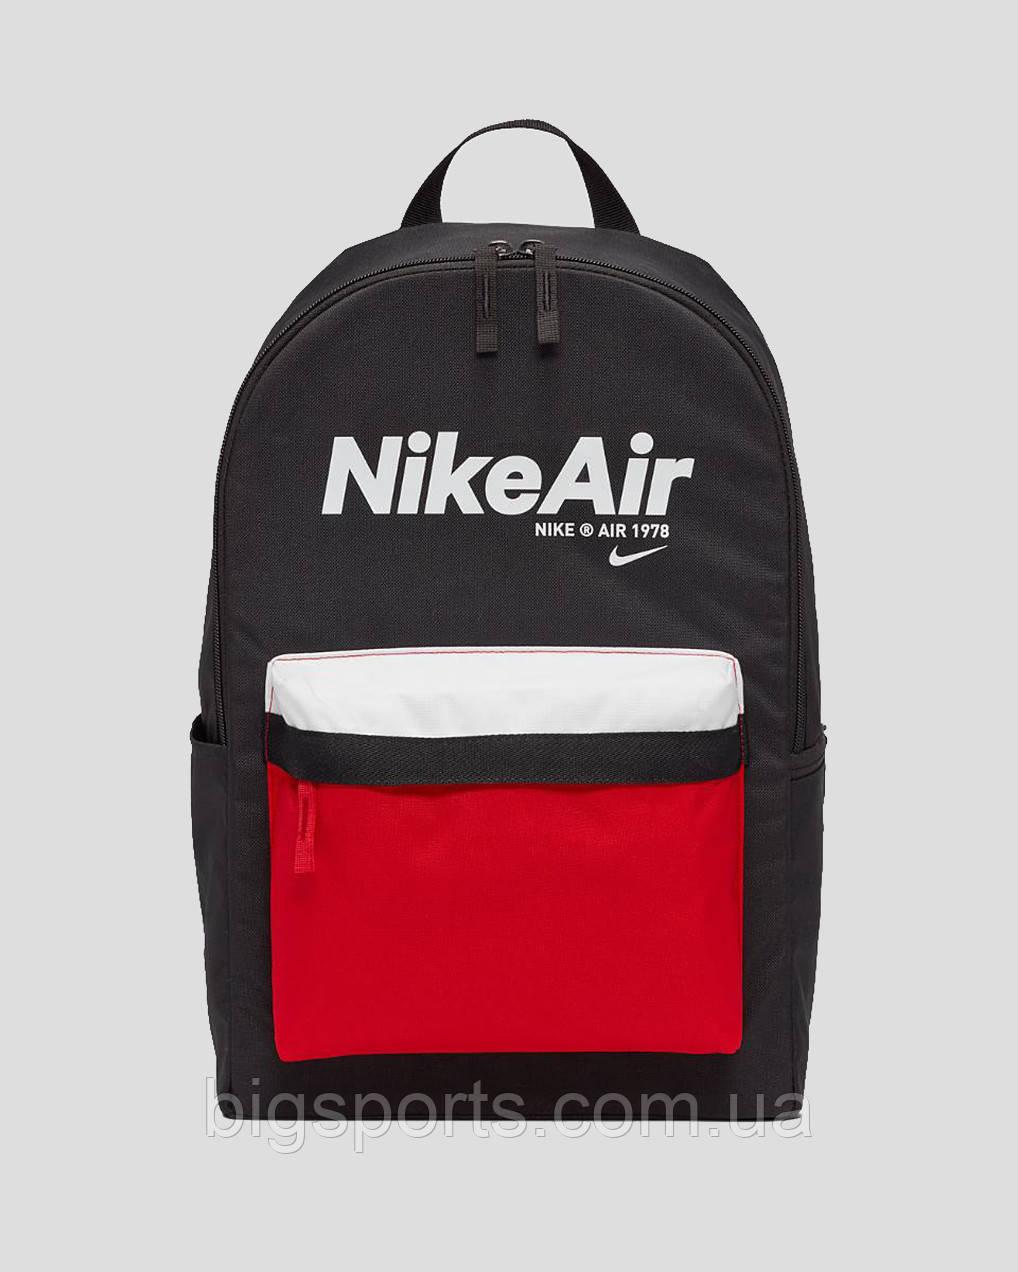 Рюкзак спортивный Nike Nk Heritage Bkpk - 2.0 Nkair (арт. CT5224-010)